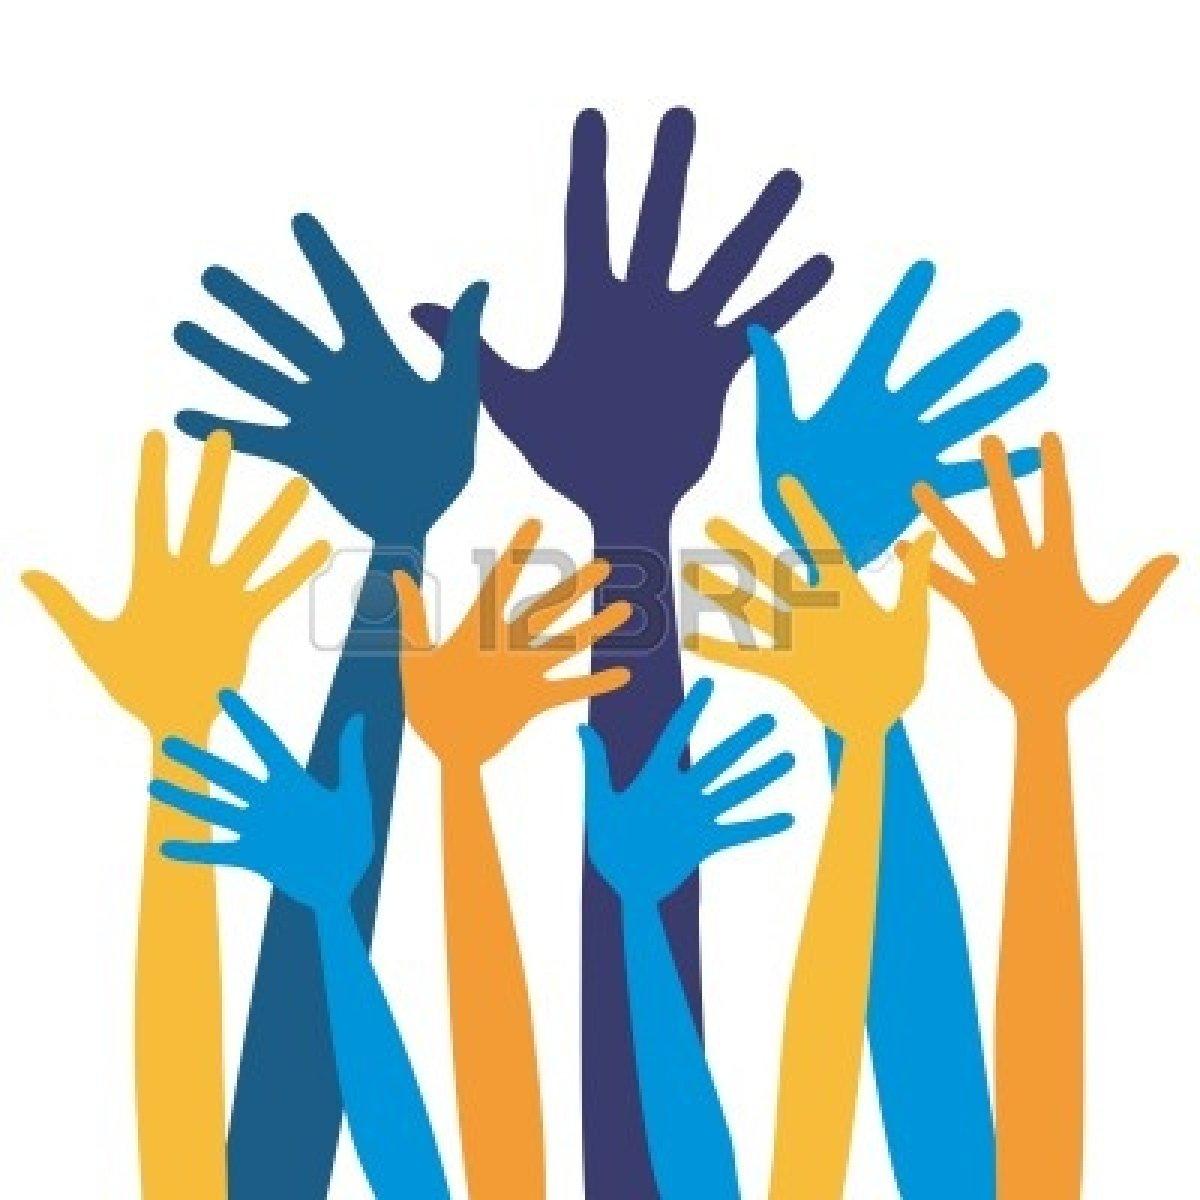 Hands raised in worship clipart jpg free Raised Hands Clipart | Free download best Raised Hands Clipart on ... jpg free